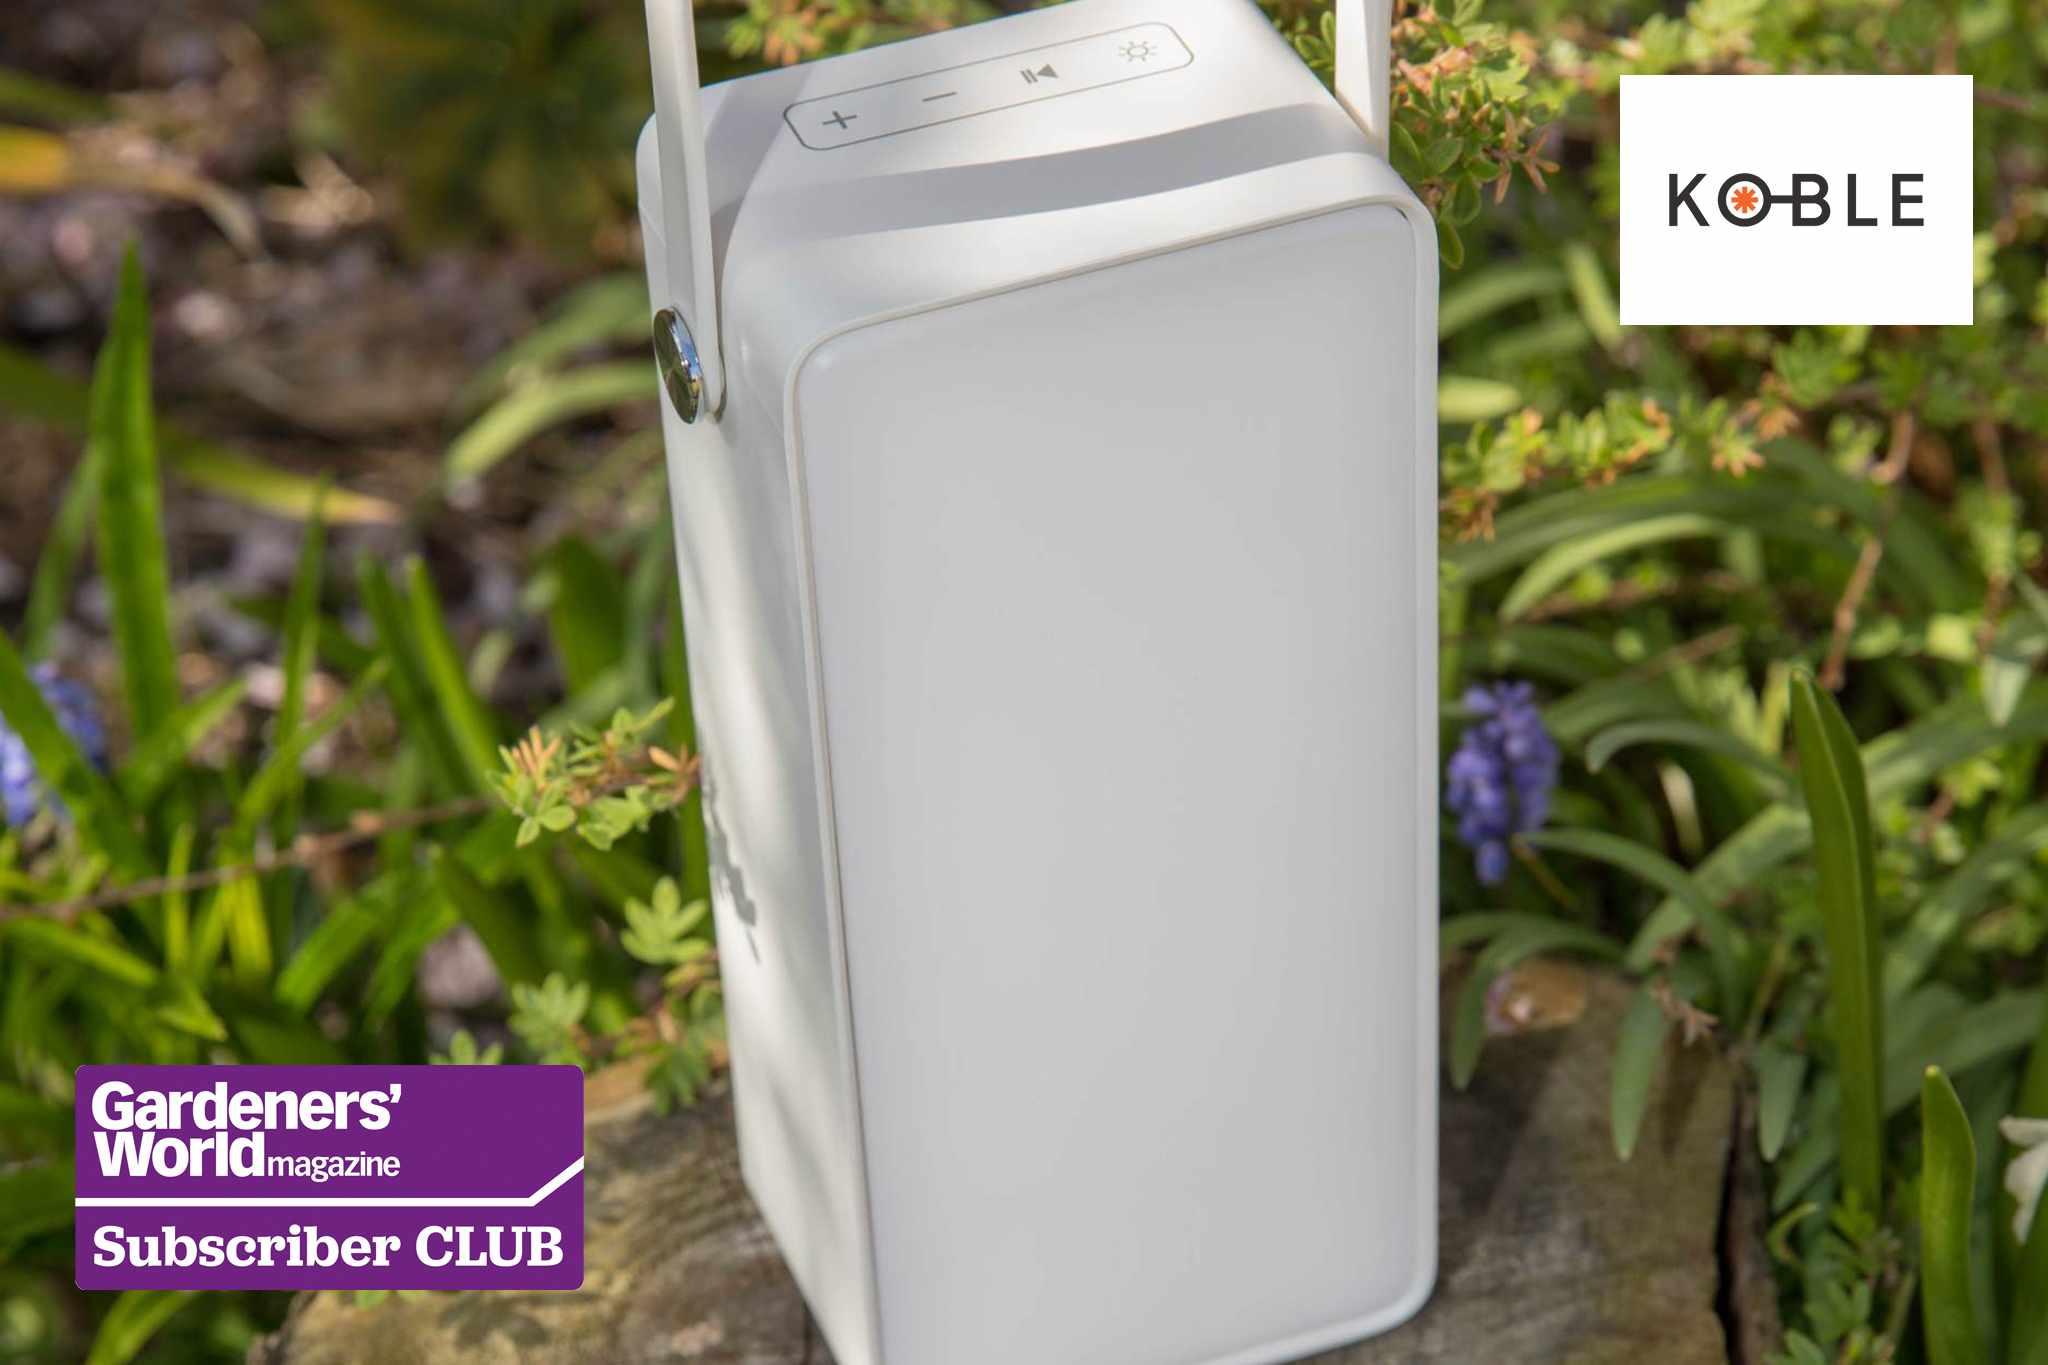 Win a Bluetooth speaker from Koble - BBC Gardeners' World Magazine